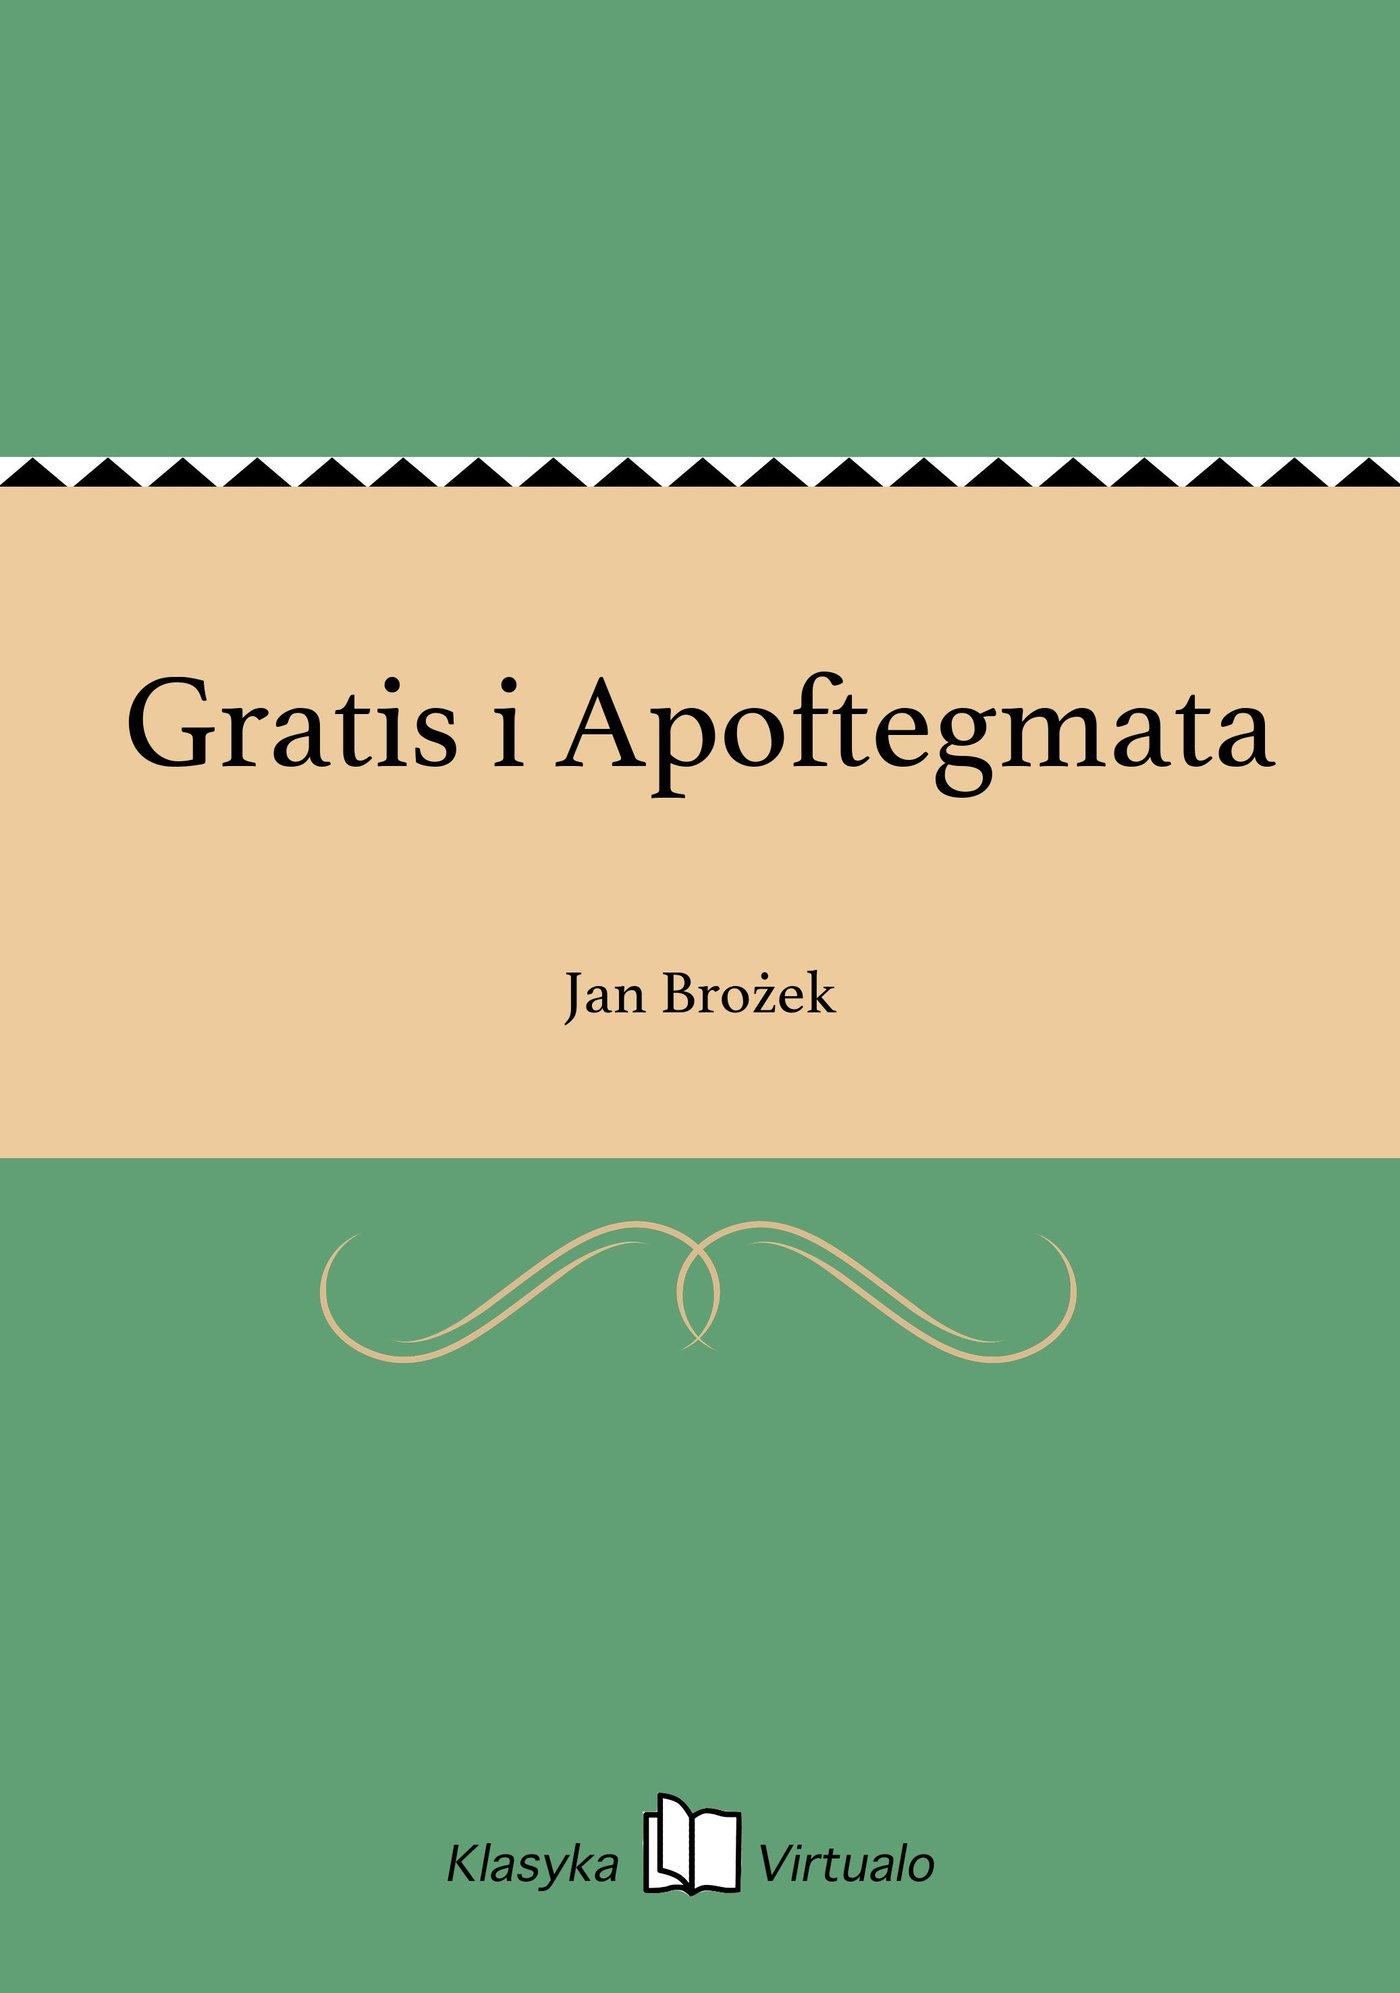 Gratis i Apoftegmata - Ebook (Książka EPUB) do pobrania w formacie EPUB